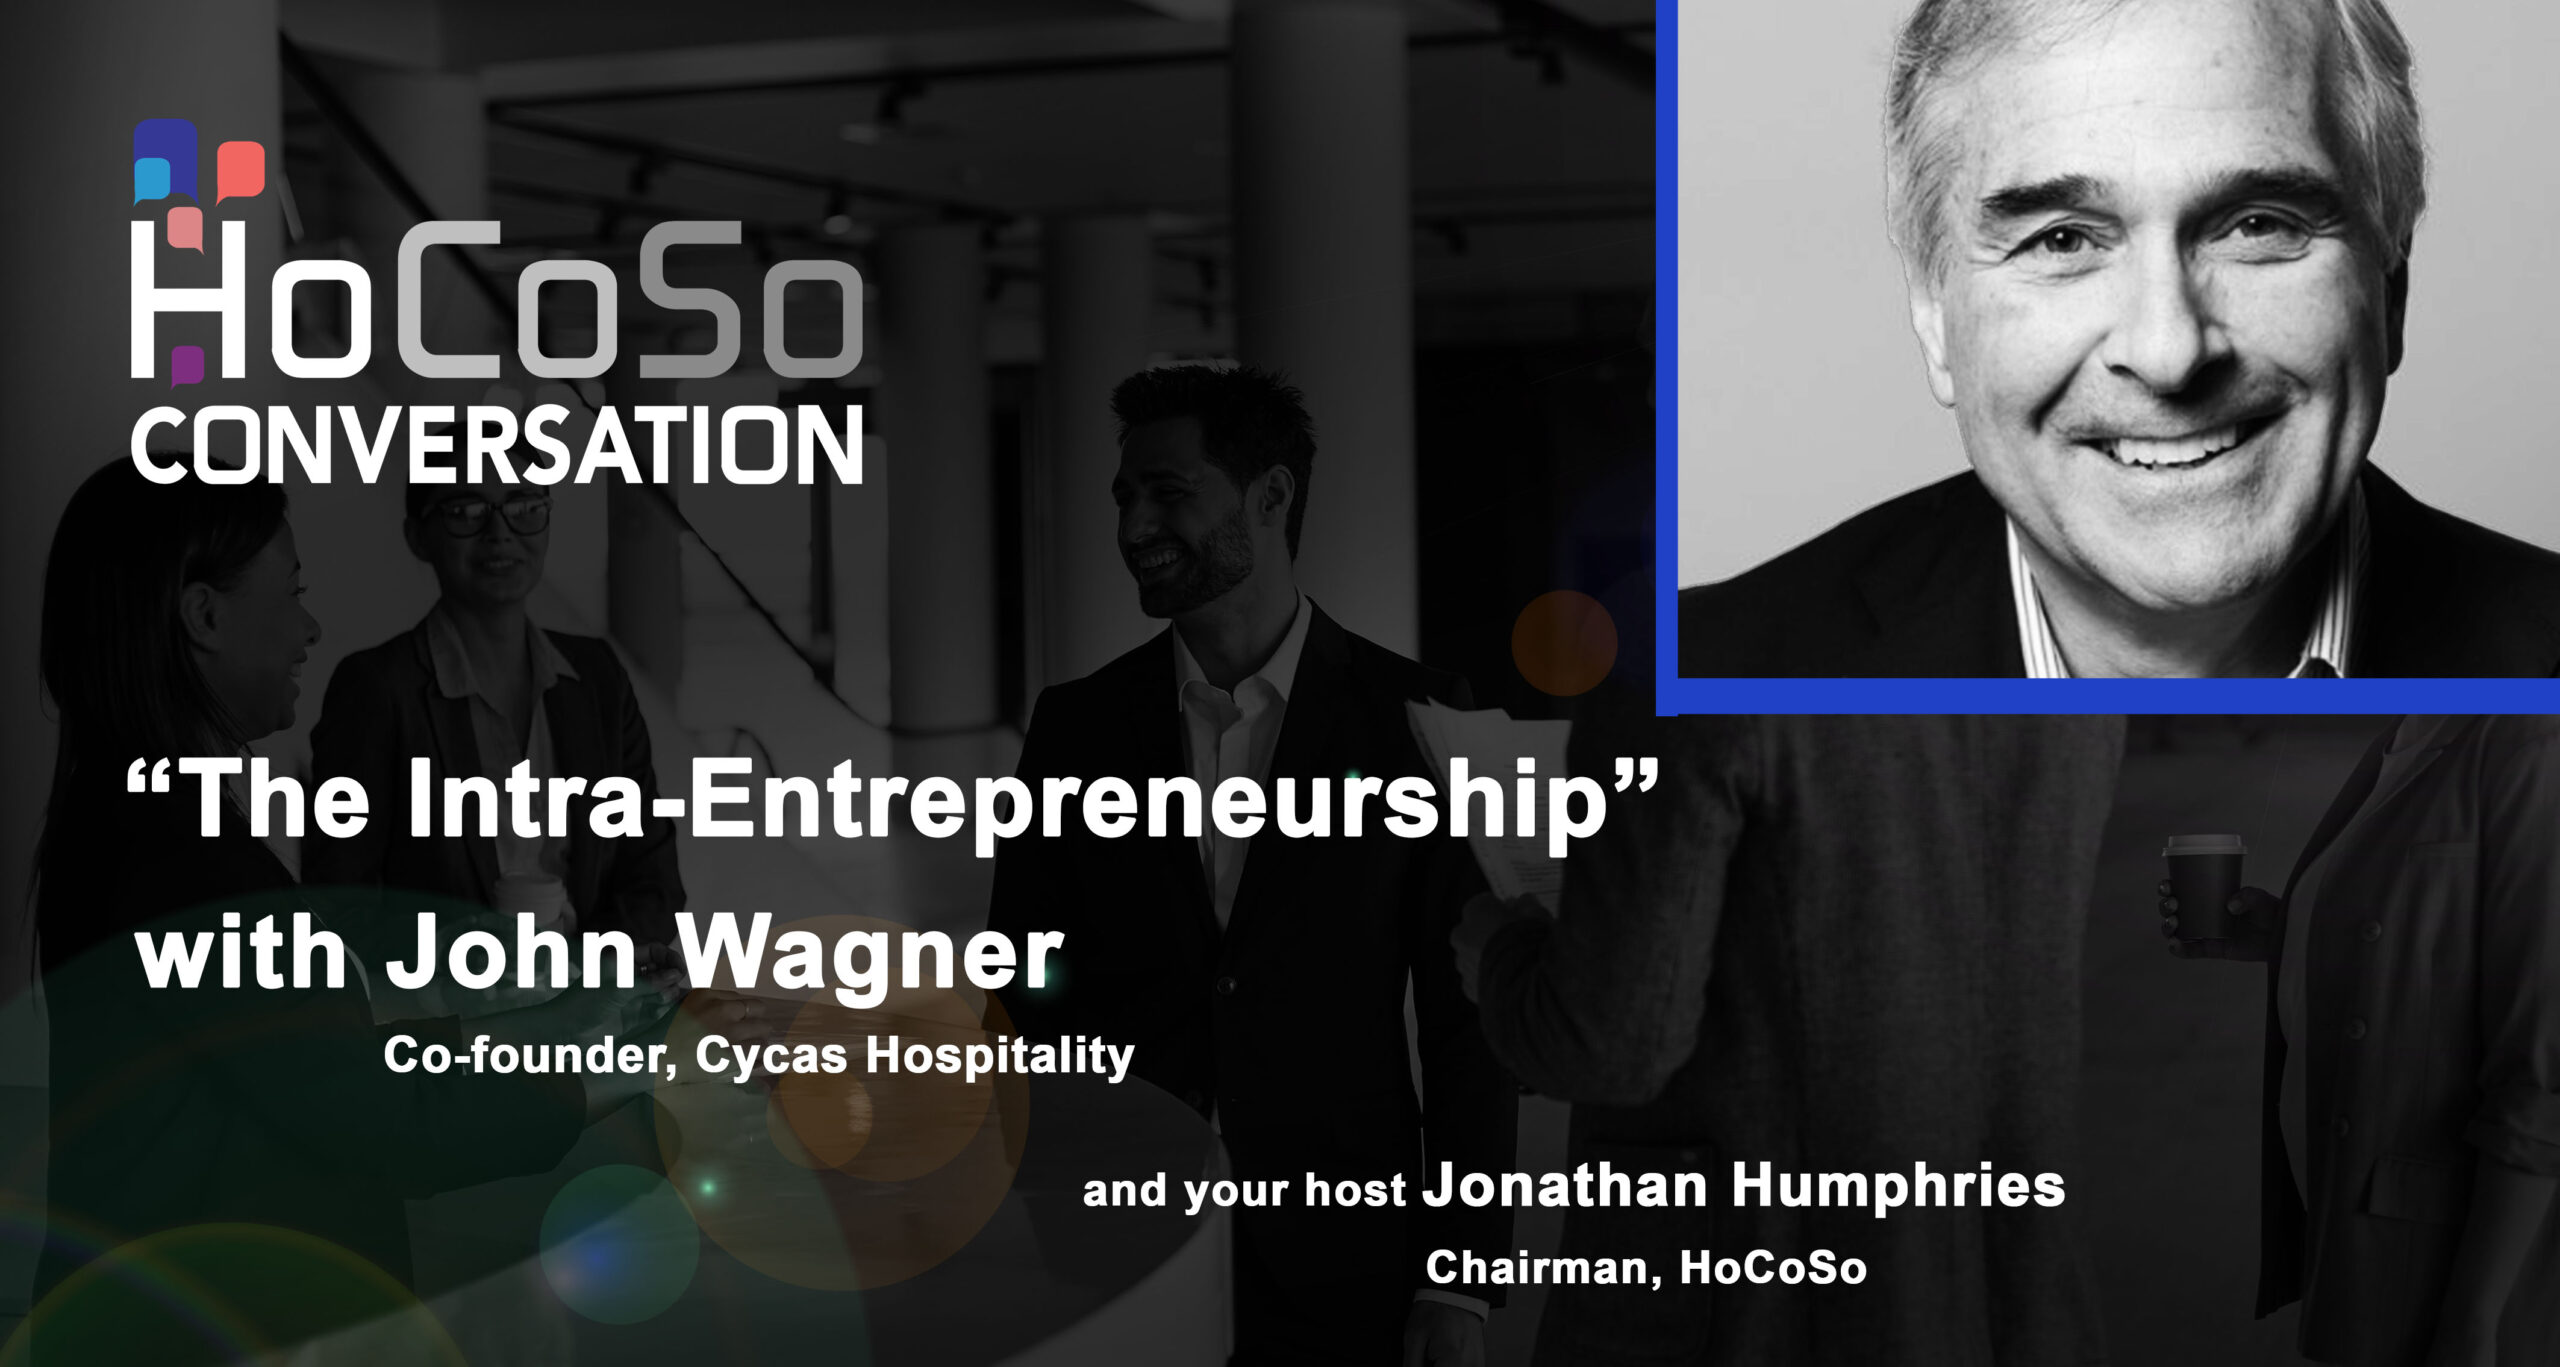 HoCoSo CONVERSATION - The Intra-Entrepreneurship - with John Wagner